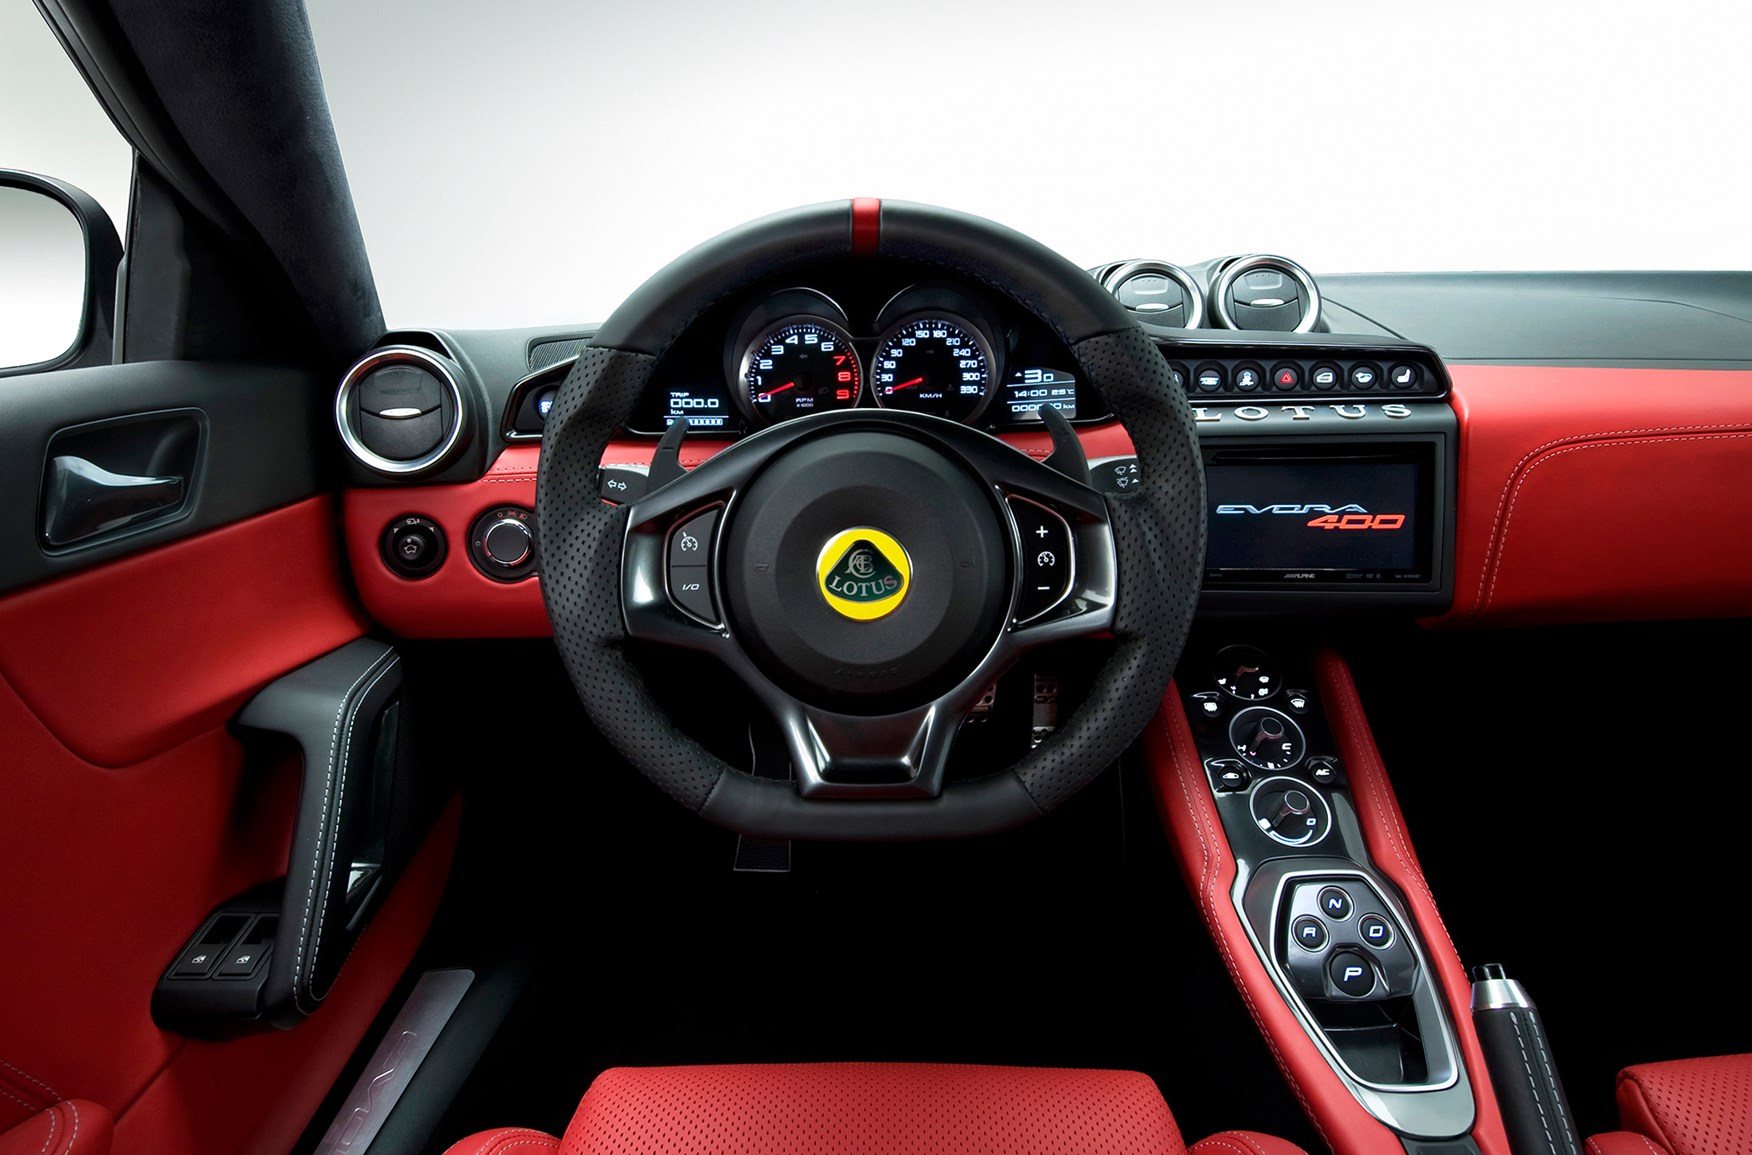 lotus evora 400 first pictures 2015 norfolk s fastest supercar yet by car magazine. Black Bedroom Furniture Sets. Home Design Ideas